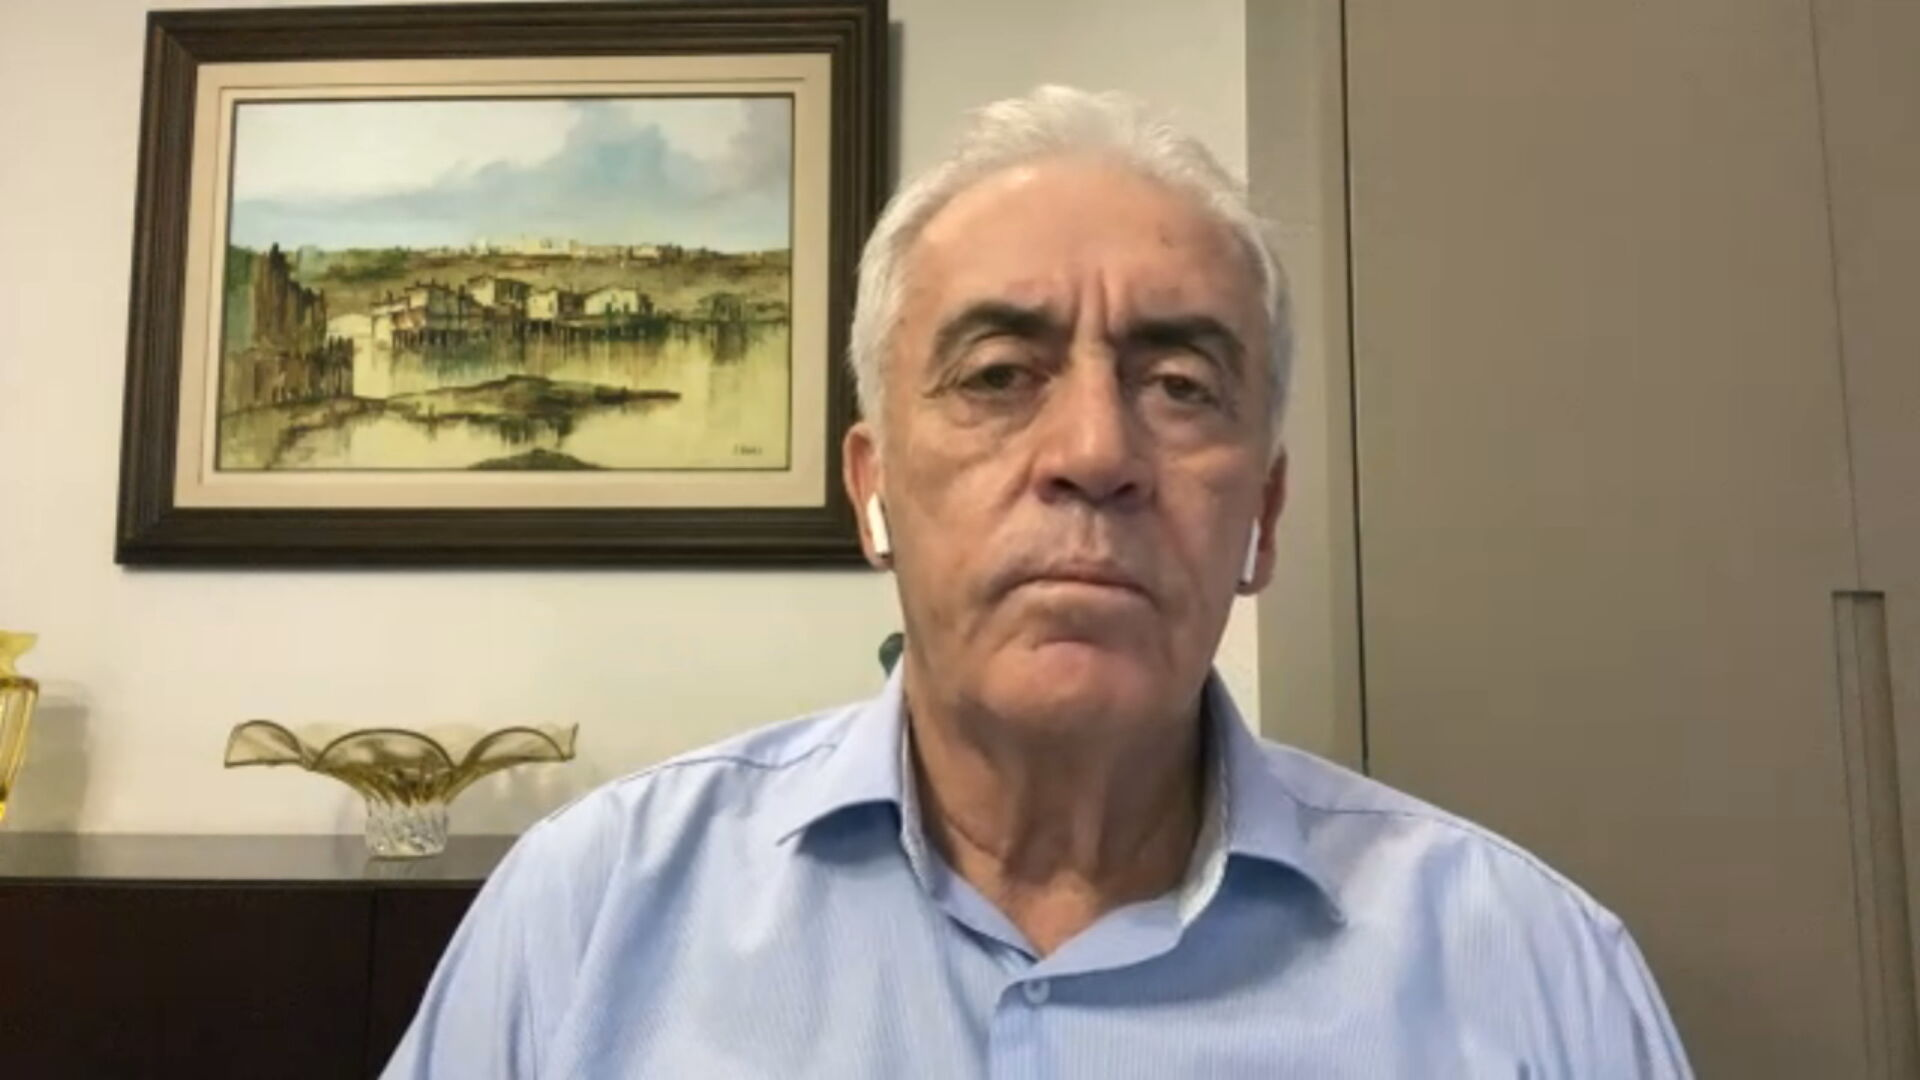 O senador Otto Alencar (PSD-BA) conversou com a CNN sobre a CPI da Covid